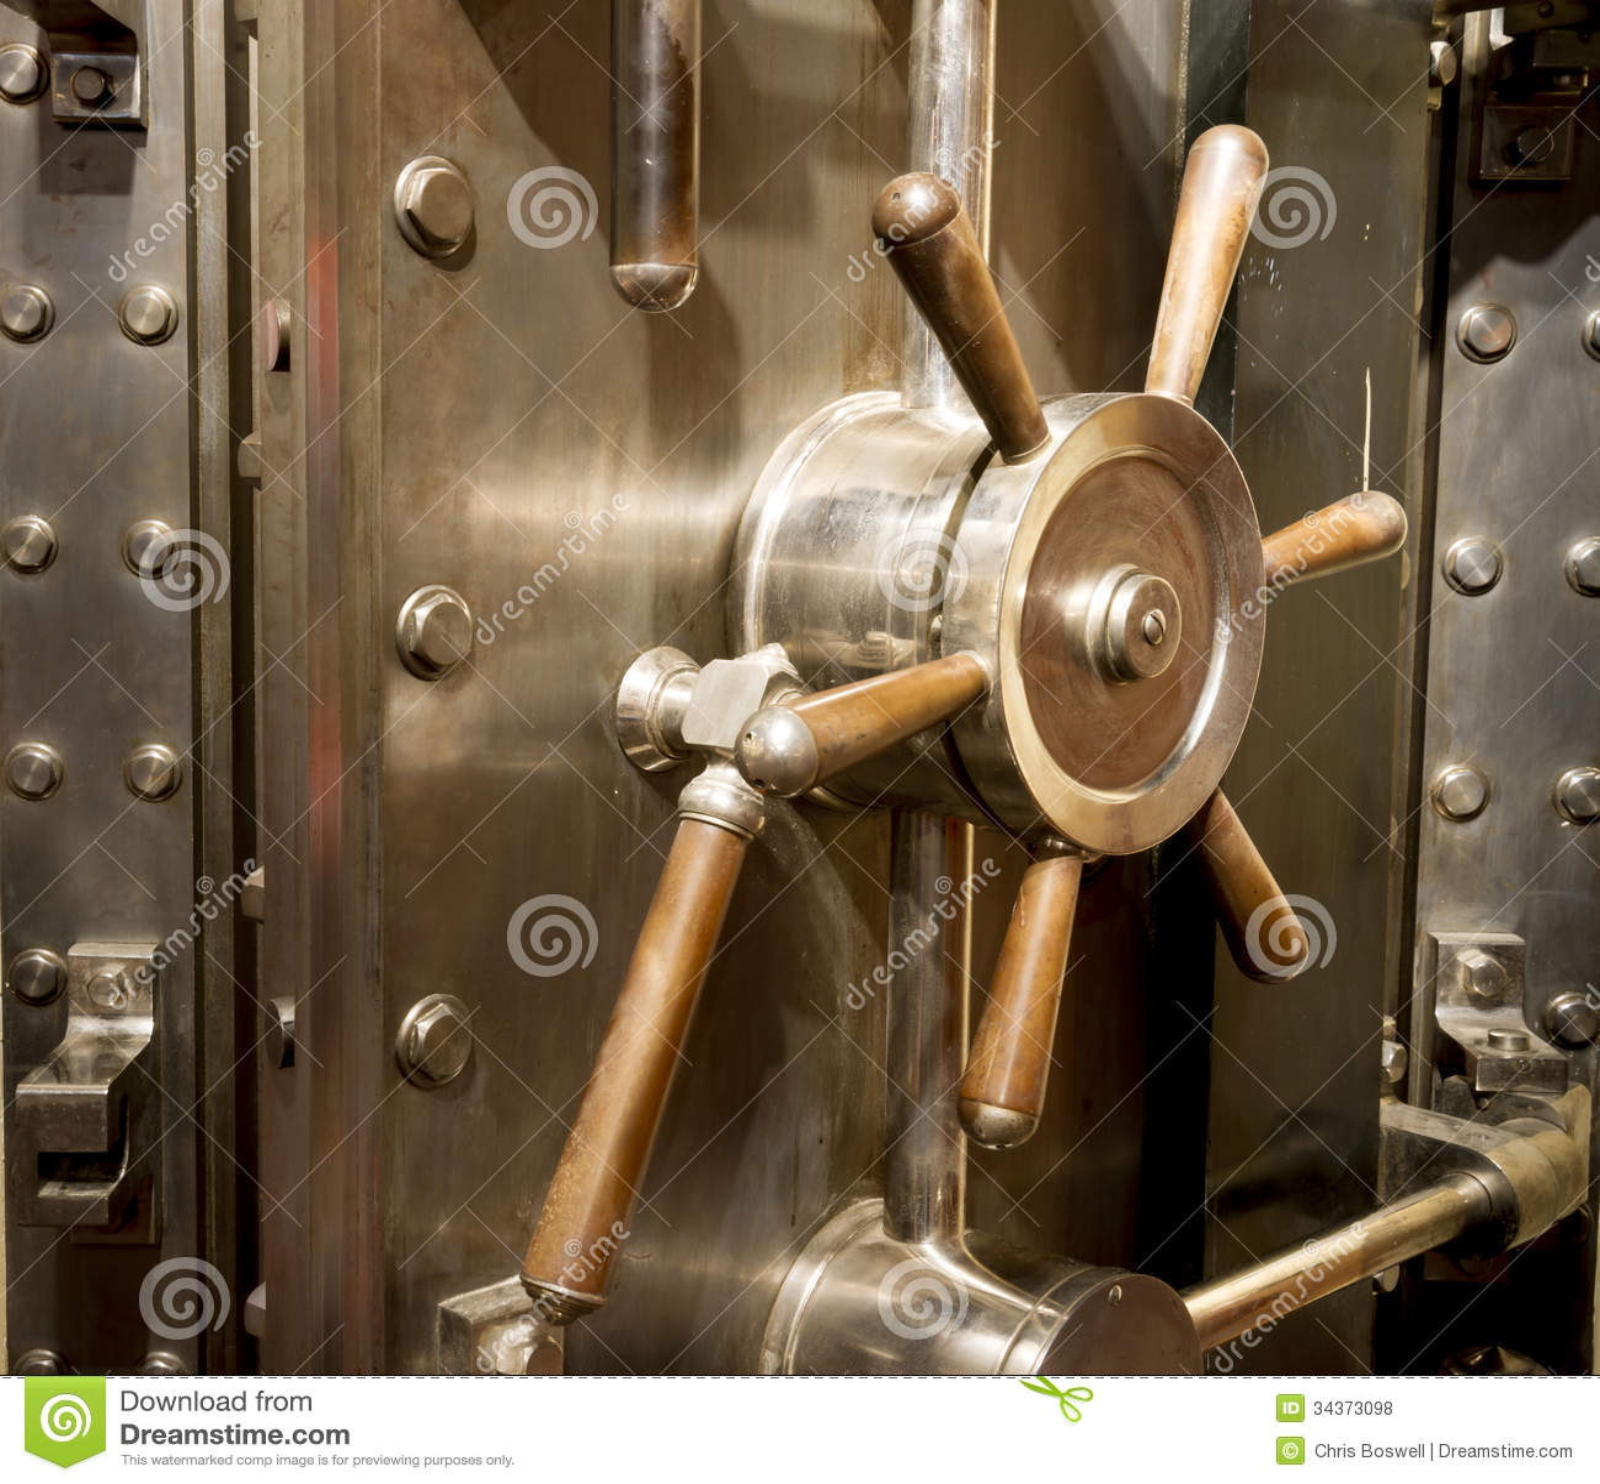 Porte Chambre Forte Bricard – Chaios.com